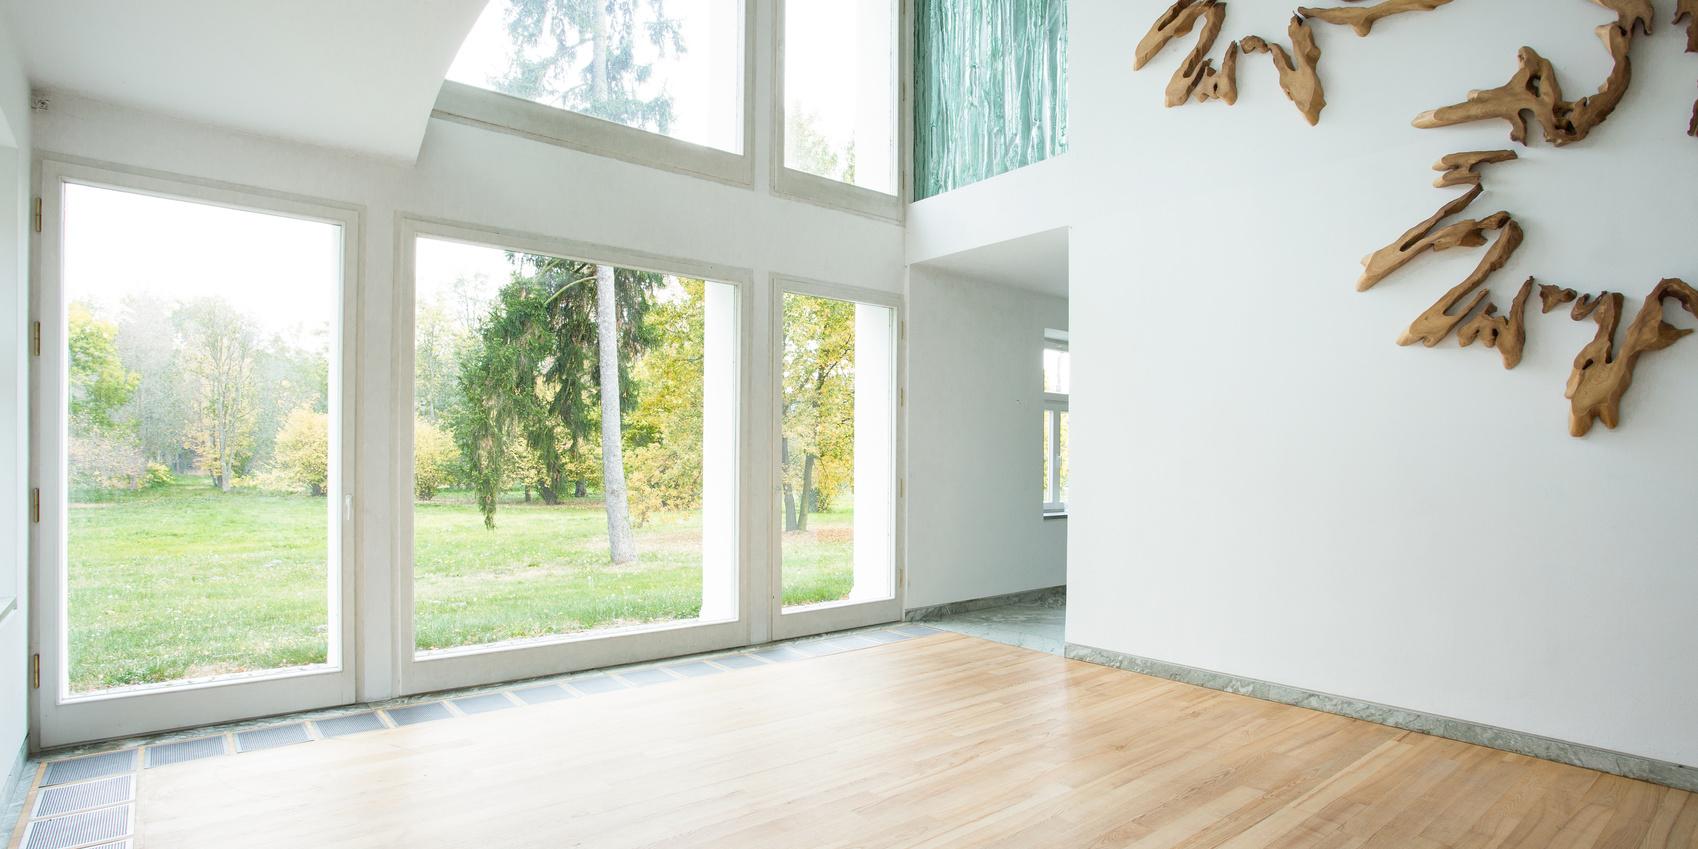 Fenster_Fischer_Innenraum_Slider3.jpg